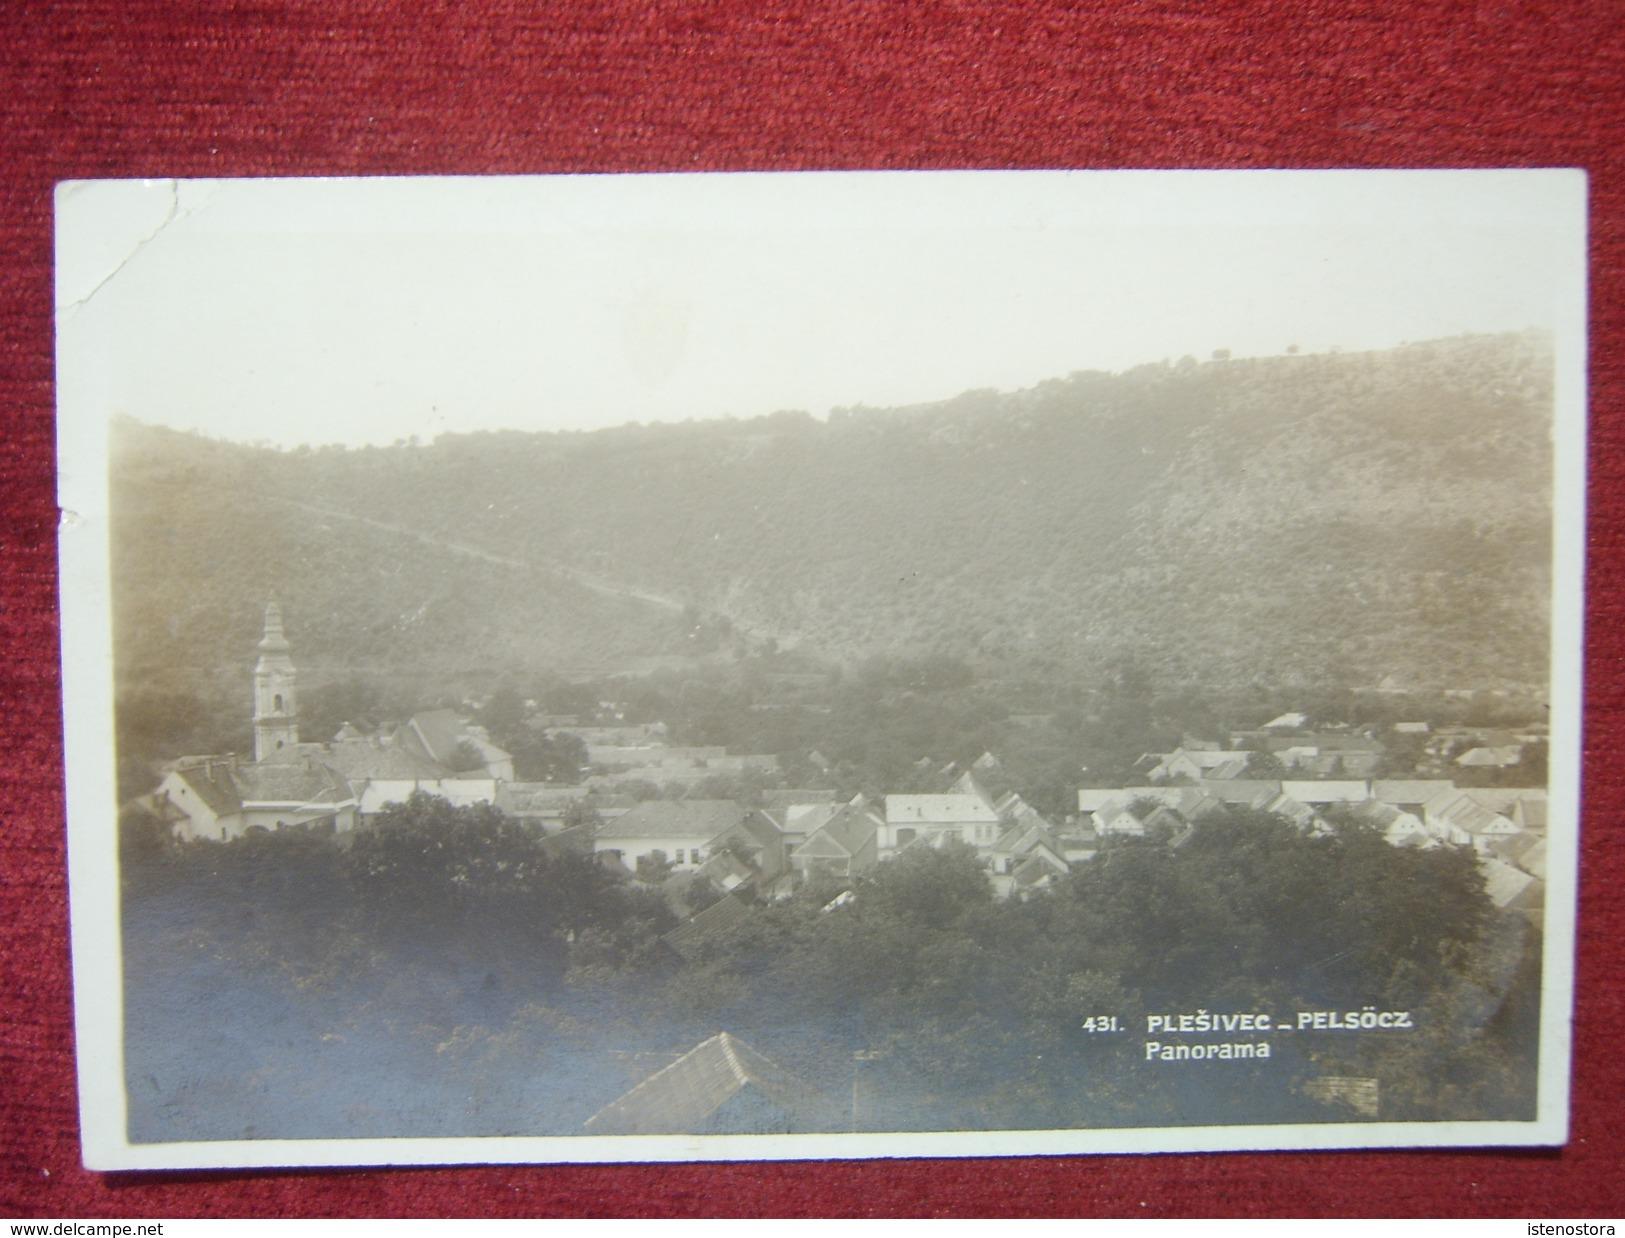 SLOVAKIA - PLESIVEC / HUNGARY - PELSOC / 1930 - Slovaquie